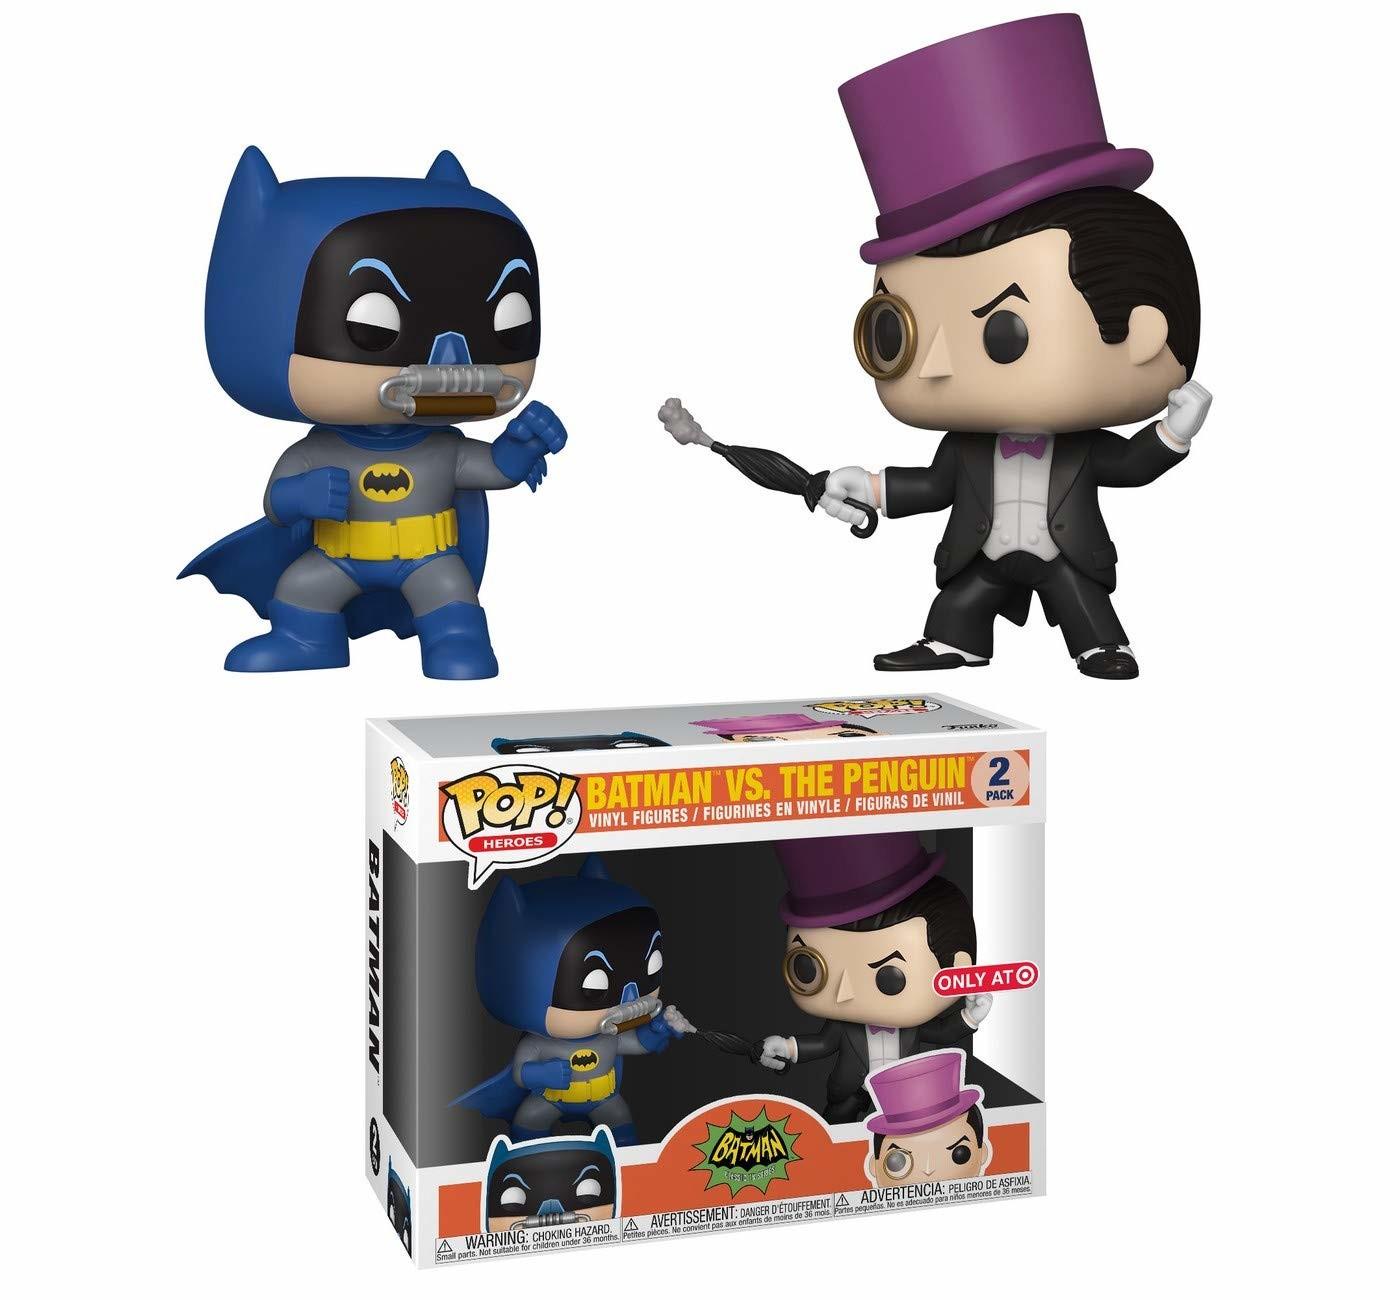 Funko DC Heroes Batman POP The Penguin Vinyl Figure NEW Toys Collectibles DC